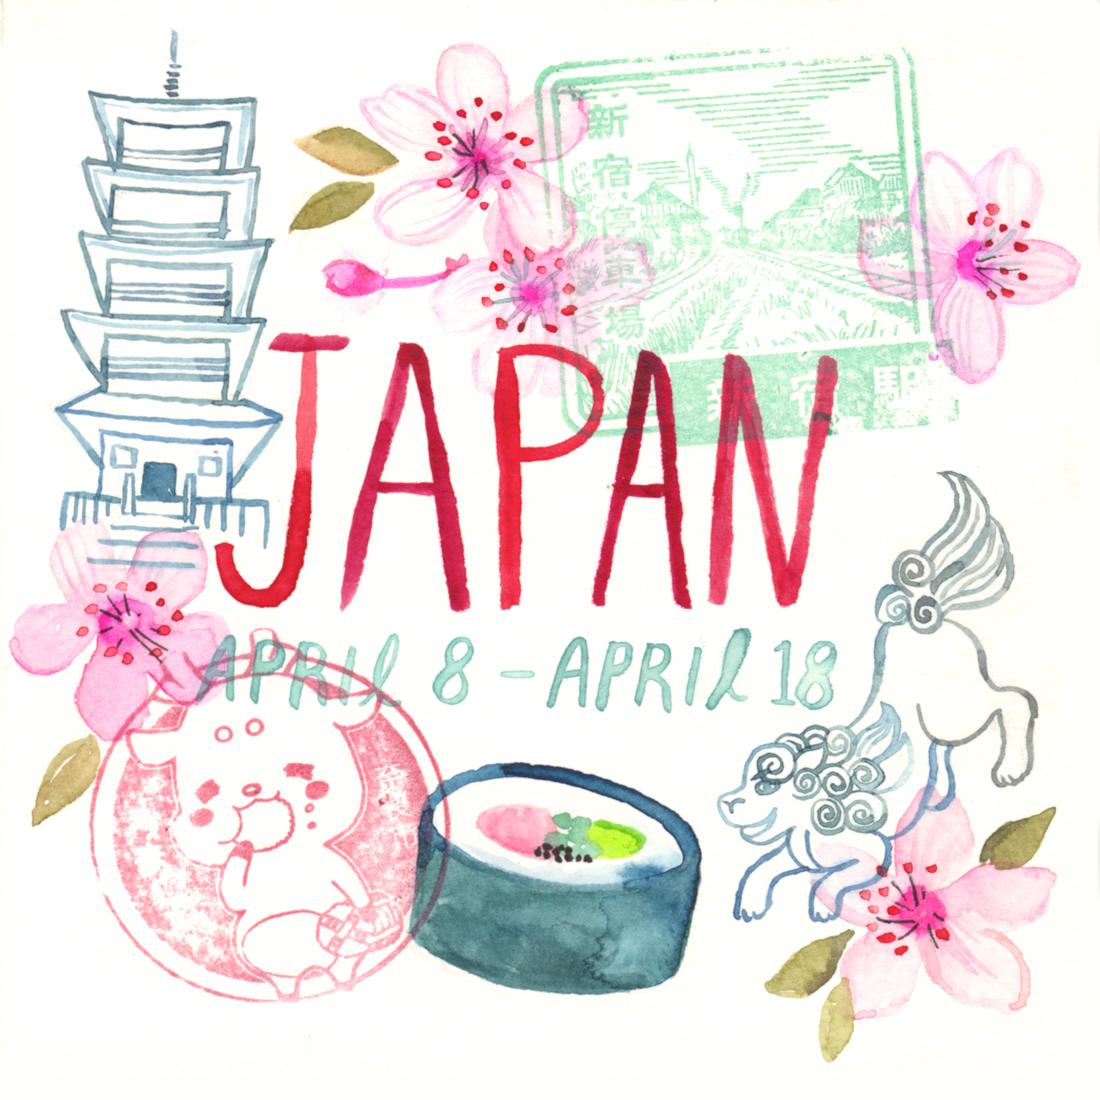 JAPAN TRAVEL SKETCHBOOK